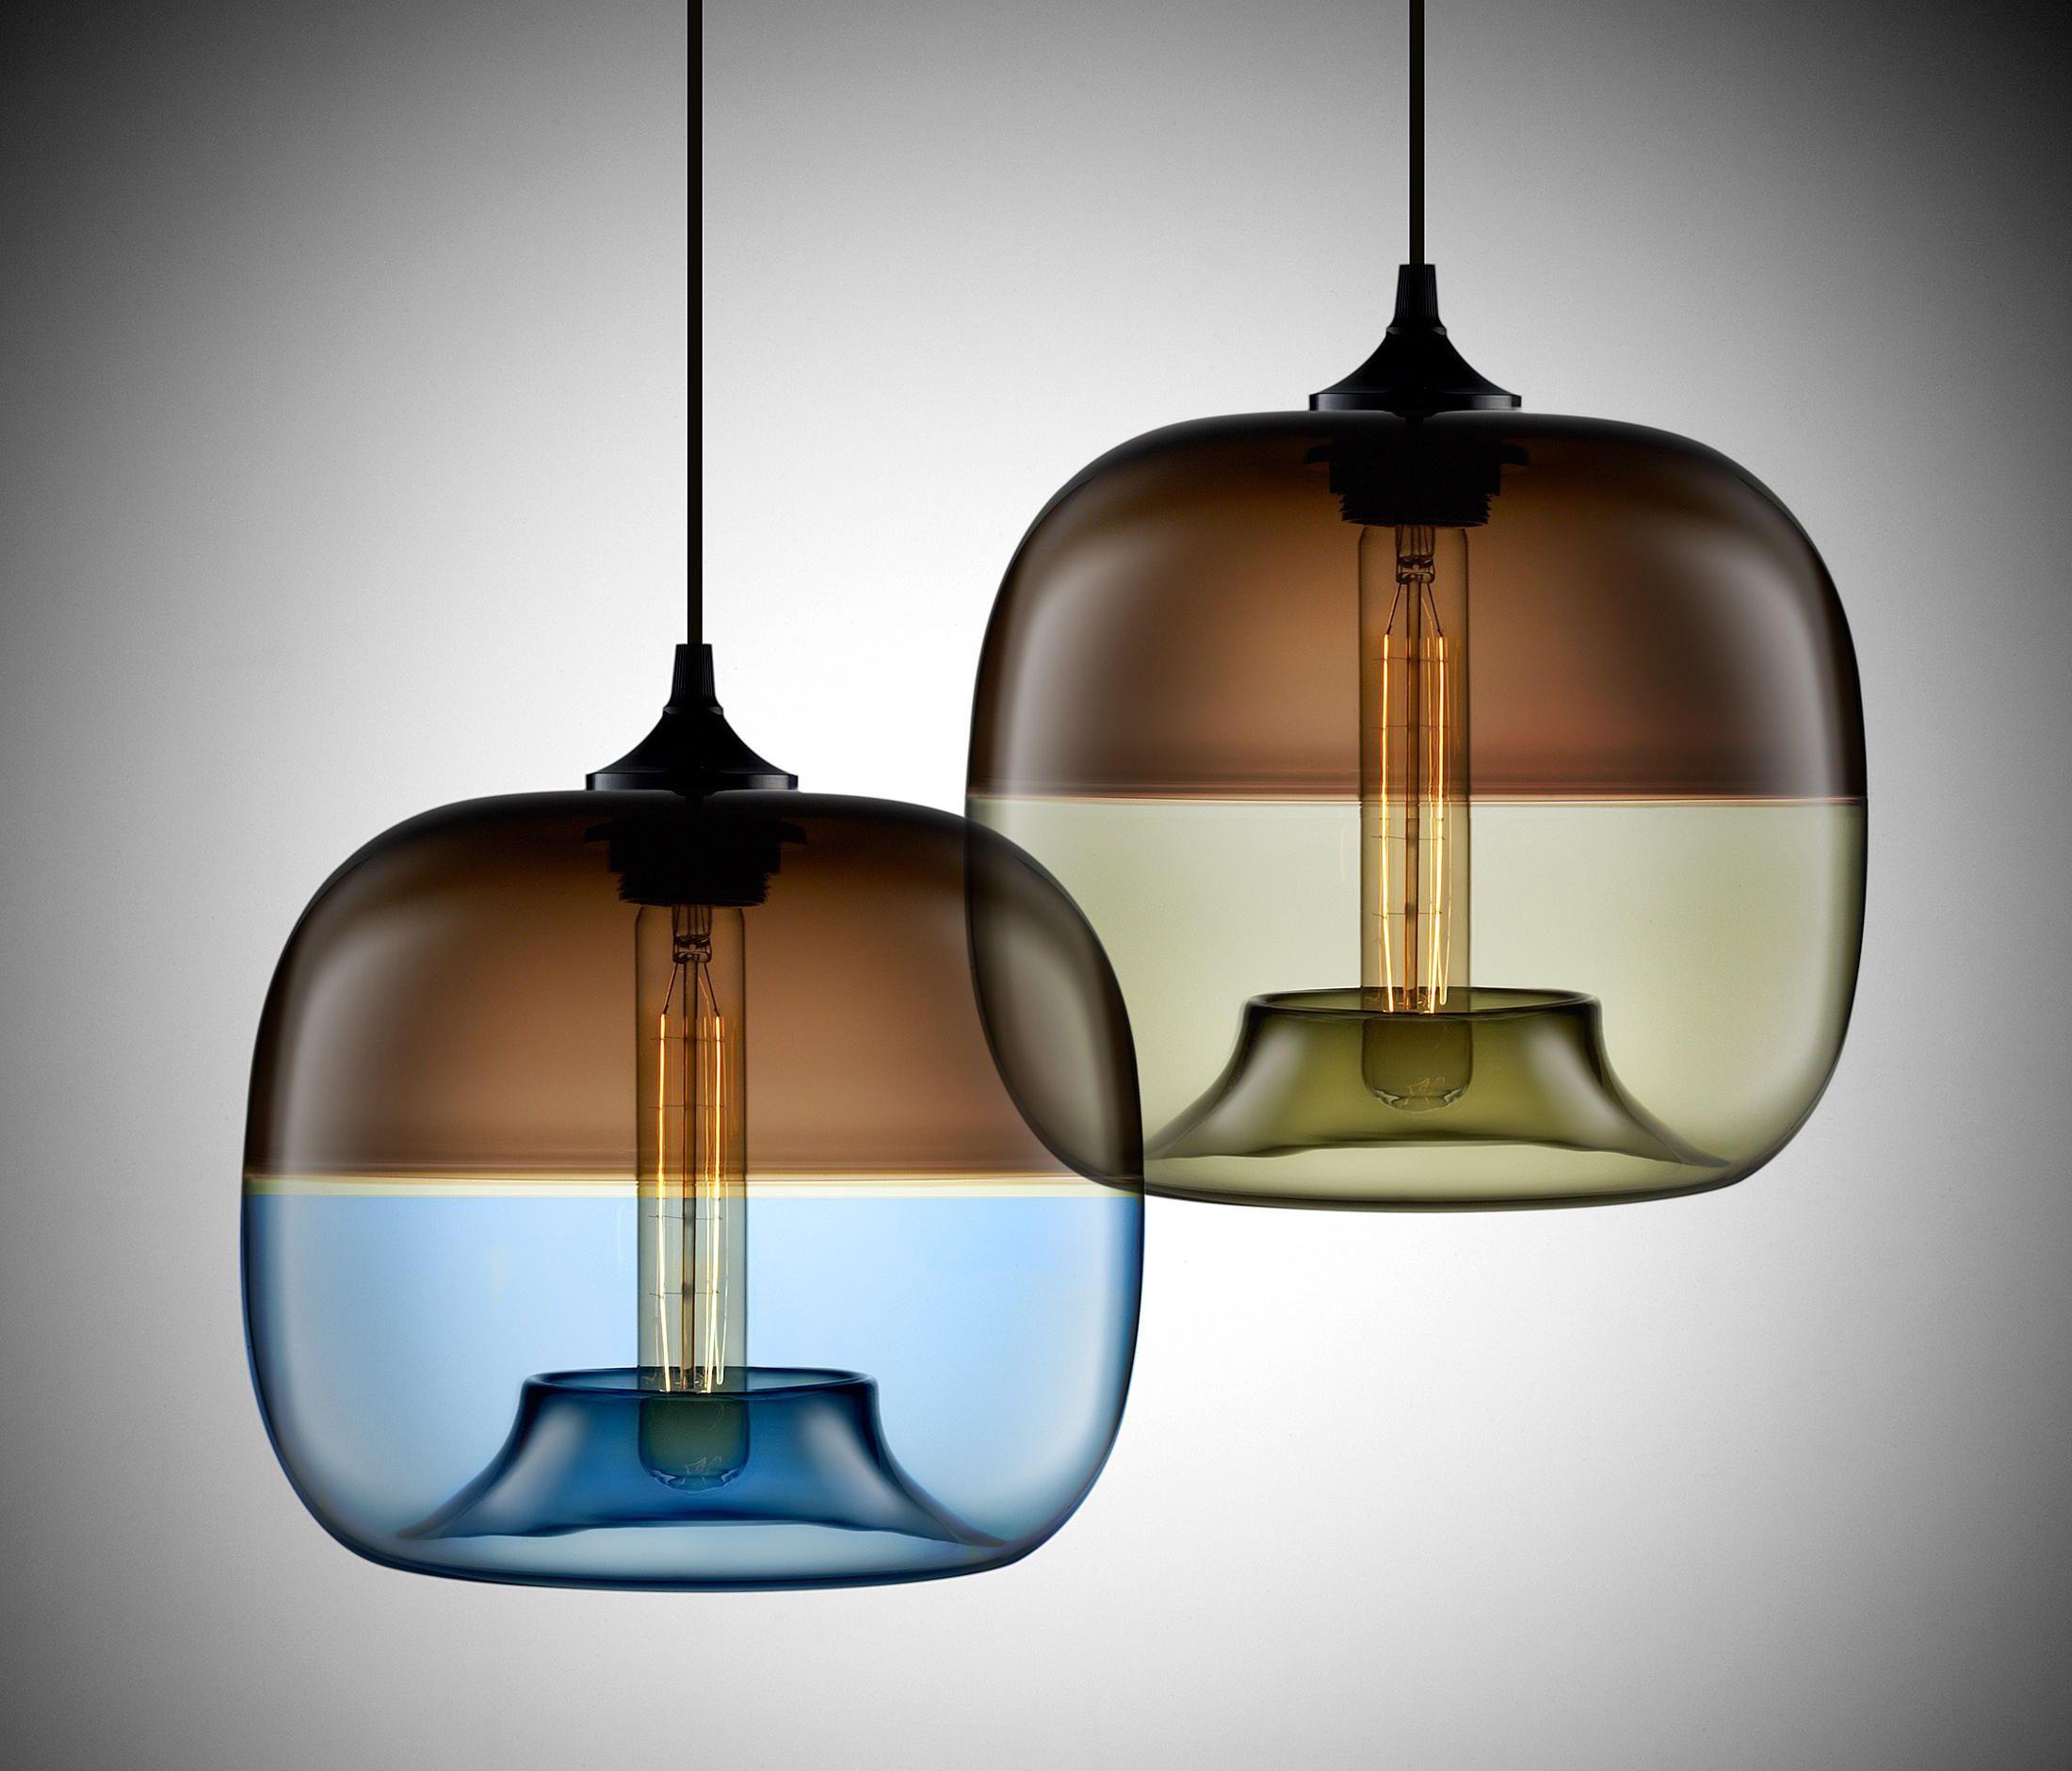 Encalmo Stamen Modern Pendant Light By Niche Niche Modern Lighting Pendant Light Contemporary Pendant Lamps